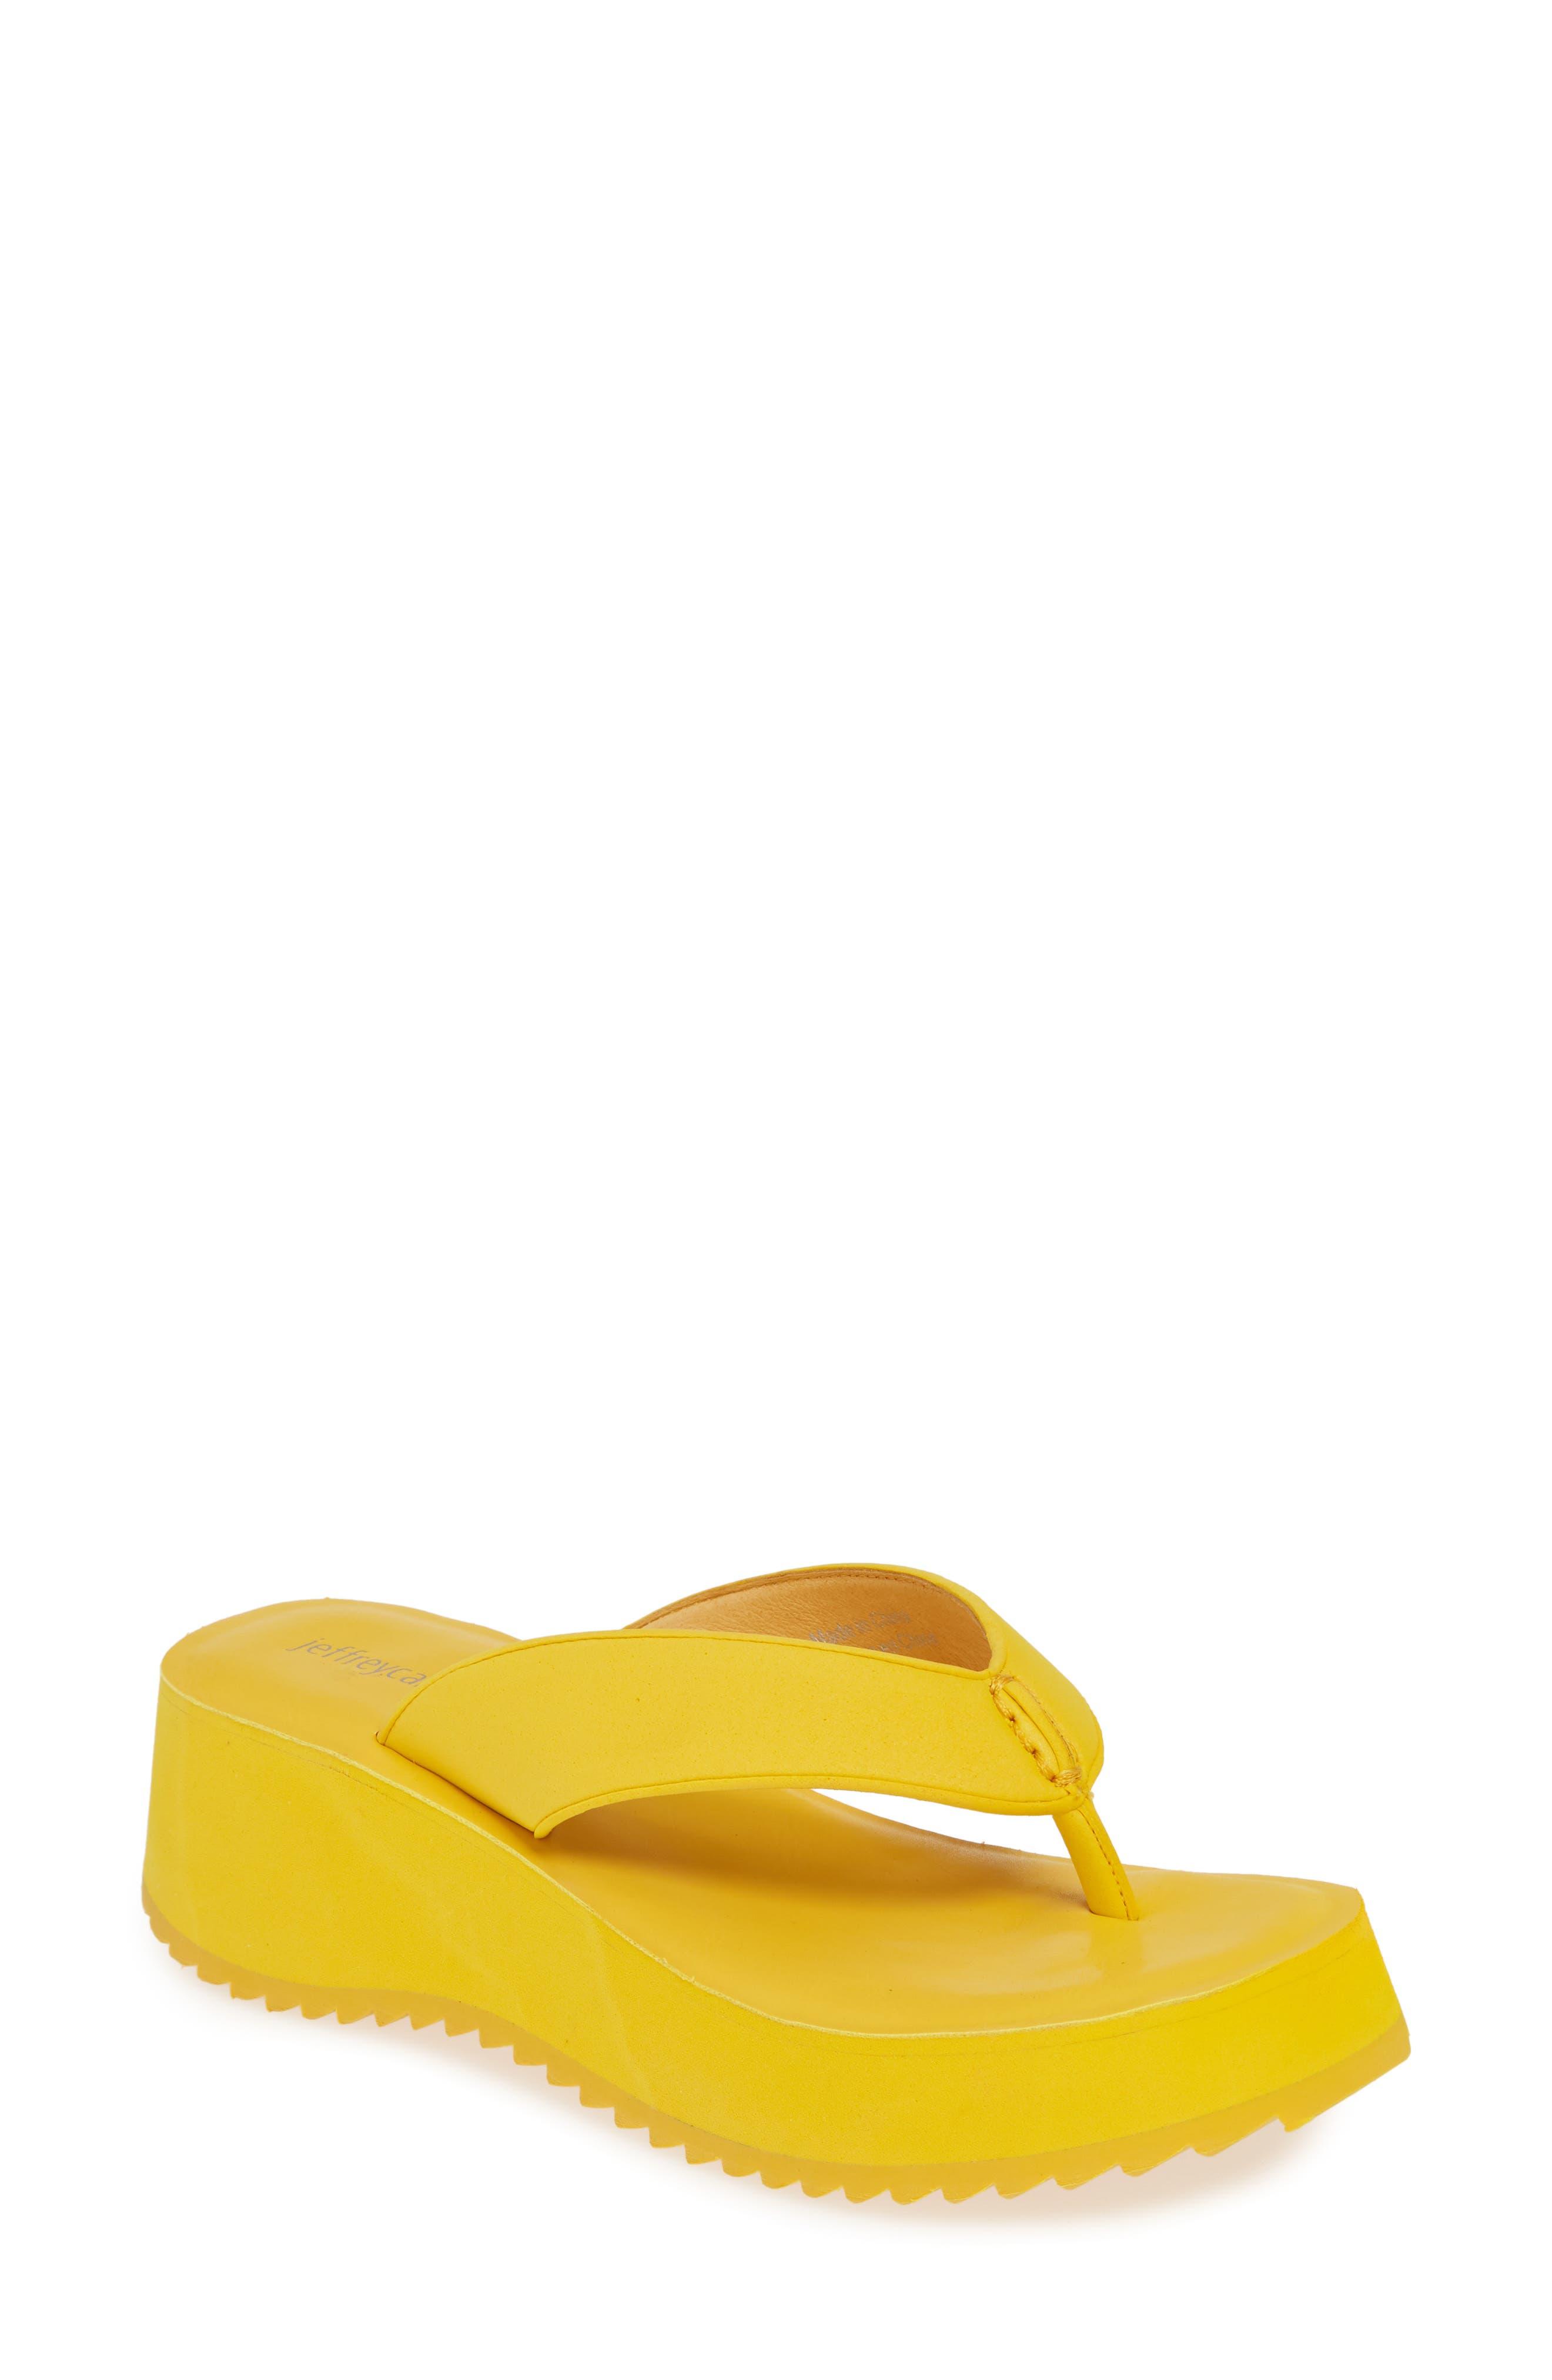 Jeffrey Campbell Platform Flip Flop, Yellow